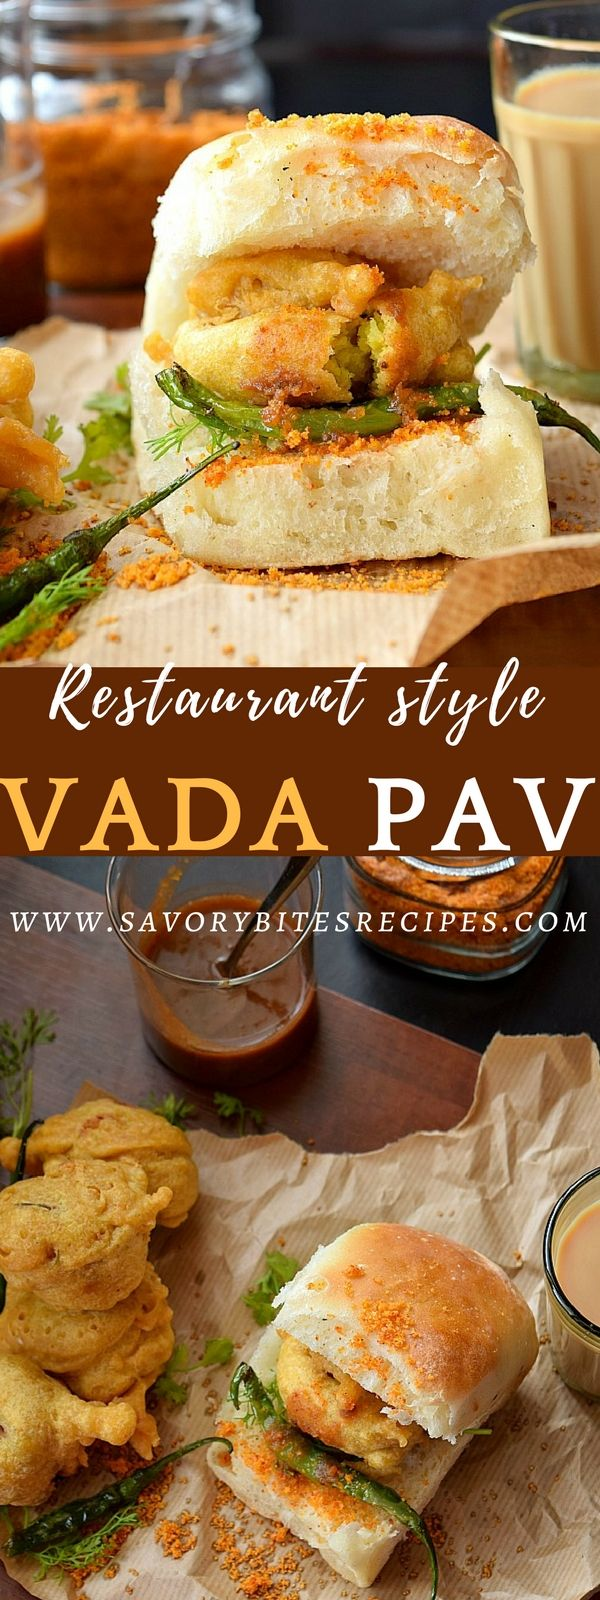 Famous Mumbai Street Food - Vada Pav , #vadapav #vada #pav #vegetarian #recipe #easy #yummy #chai #streetfood